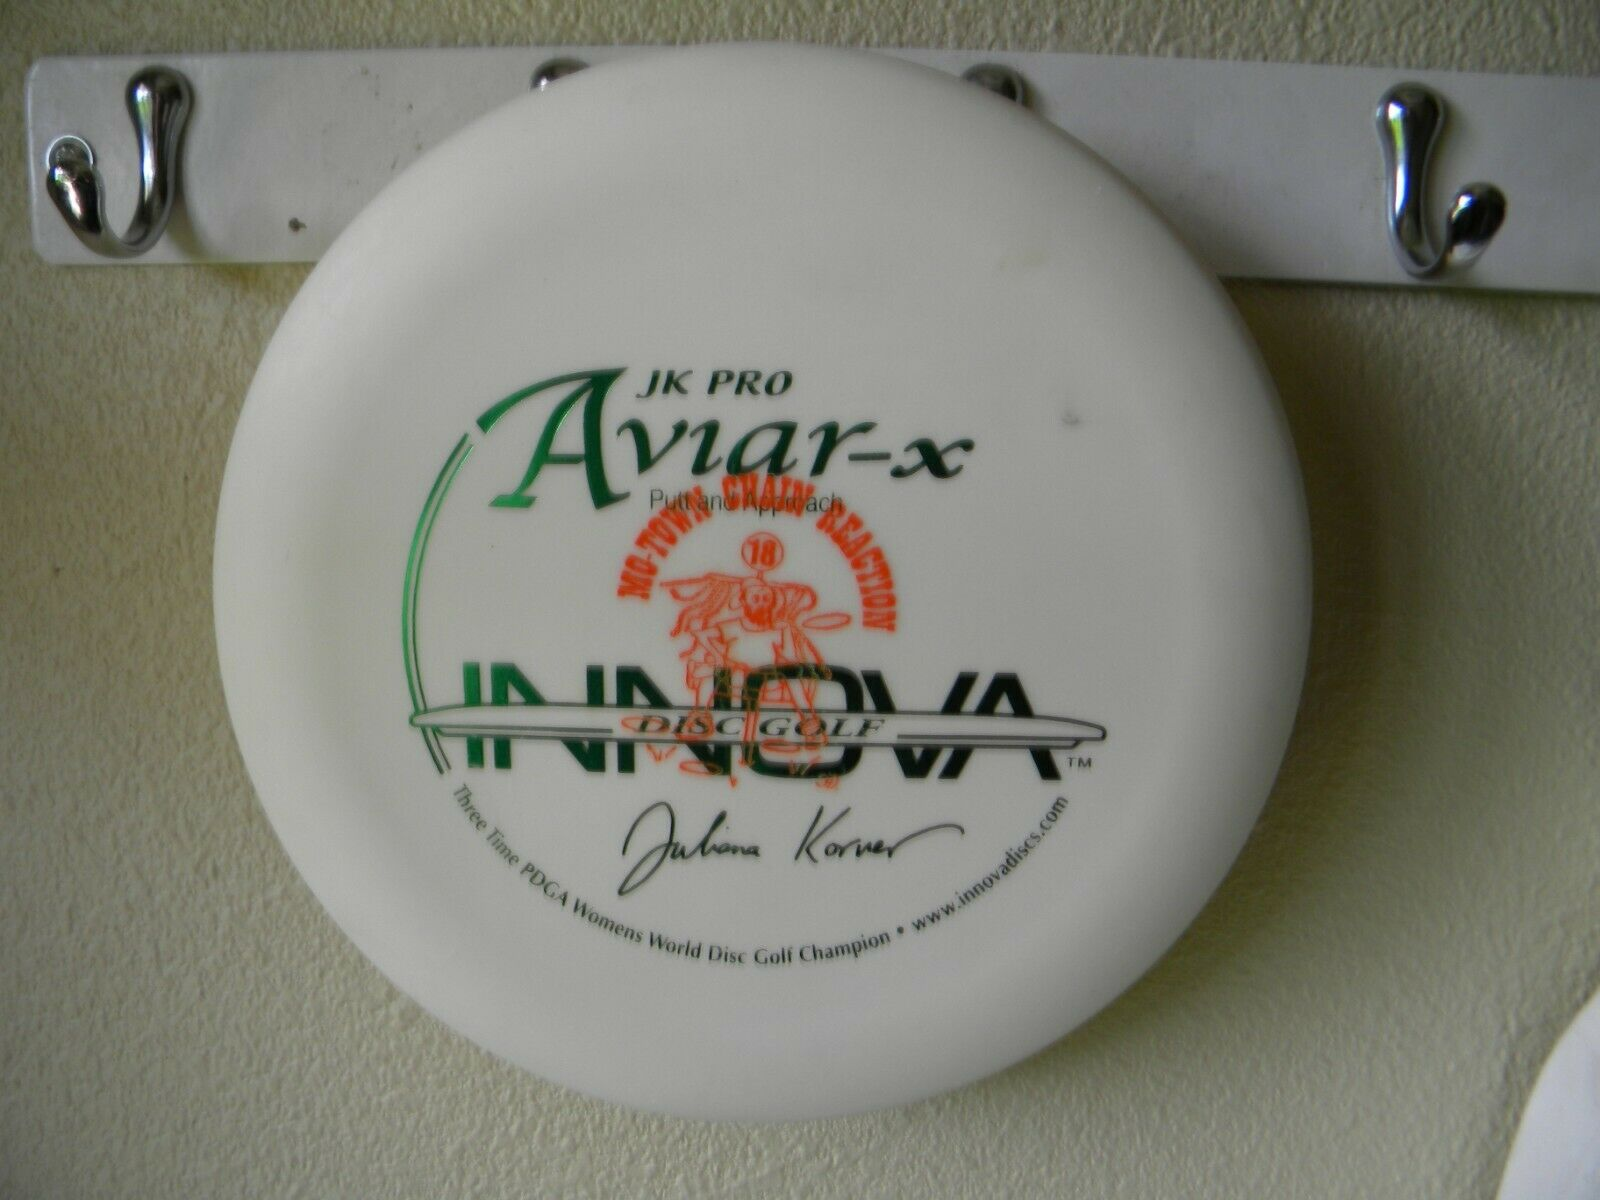 Innova PFN 3X JK Pro perdida-x Raro 2001 duro para encontrar nuevas